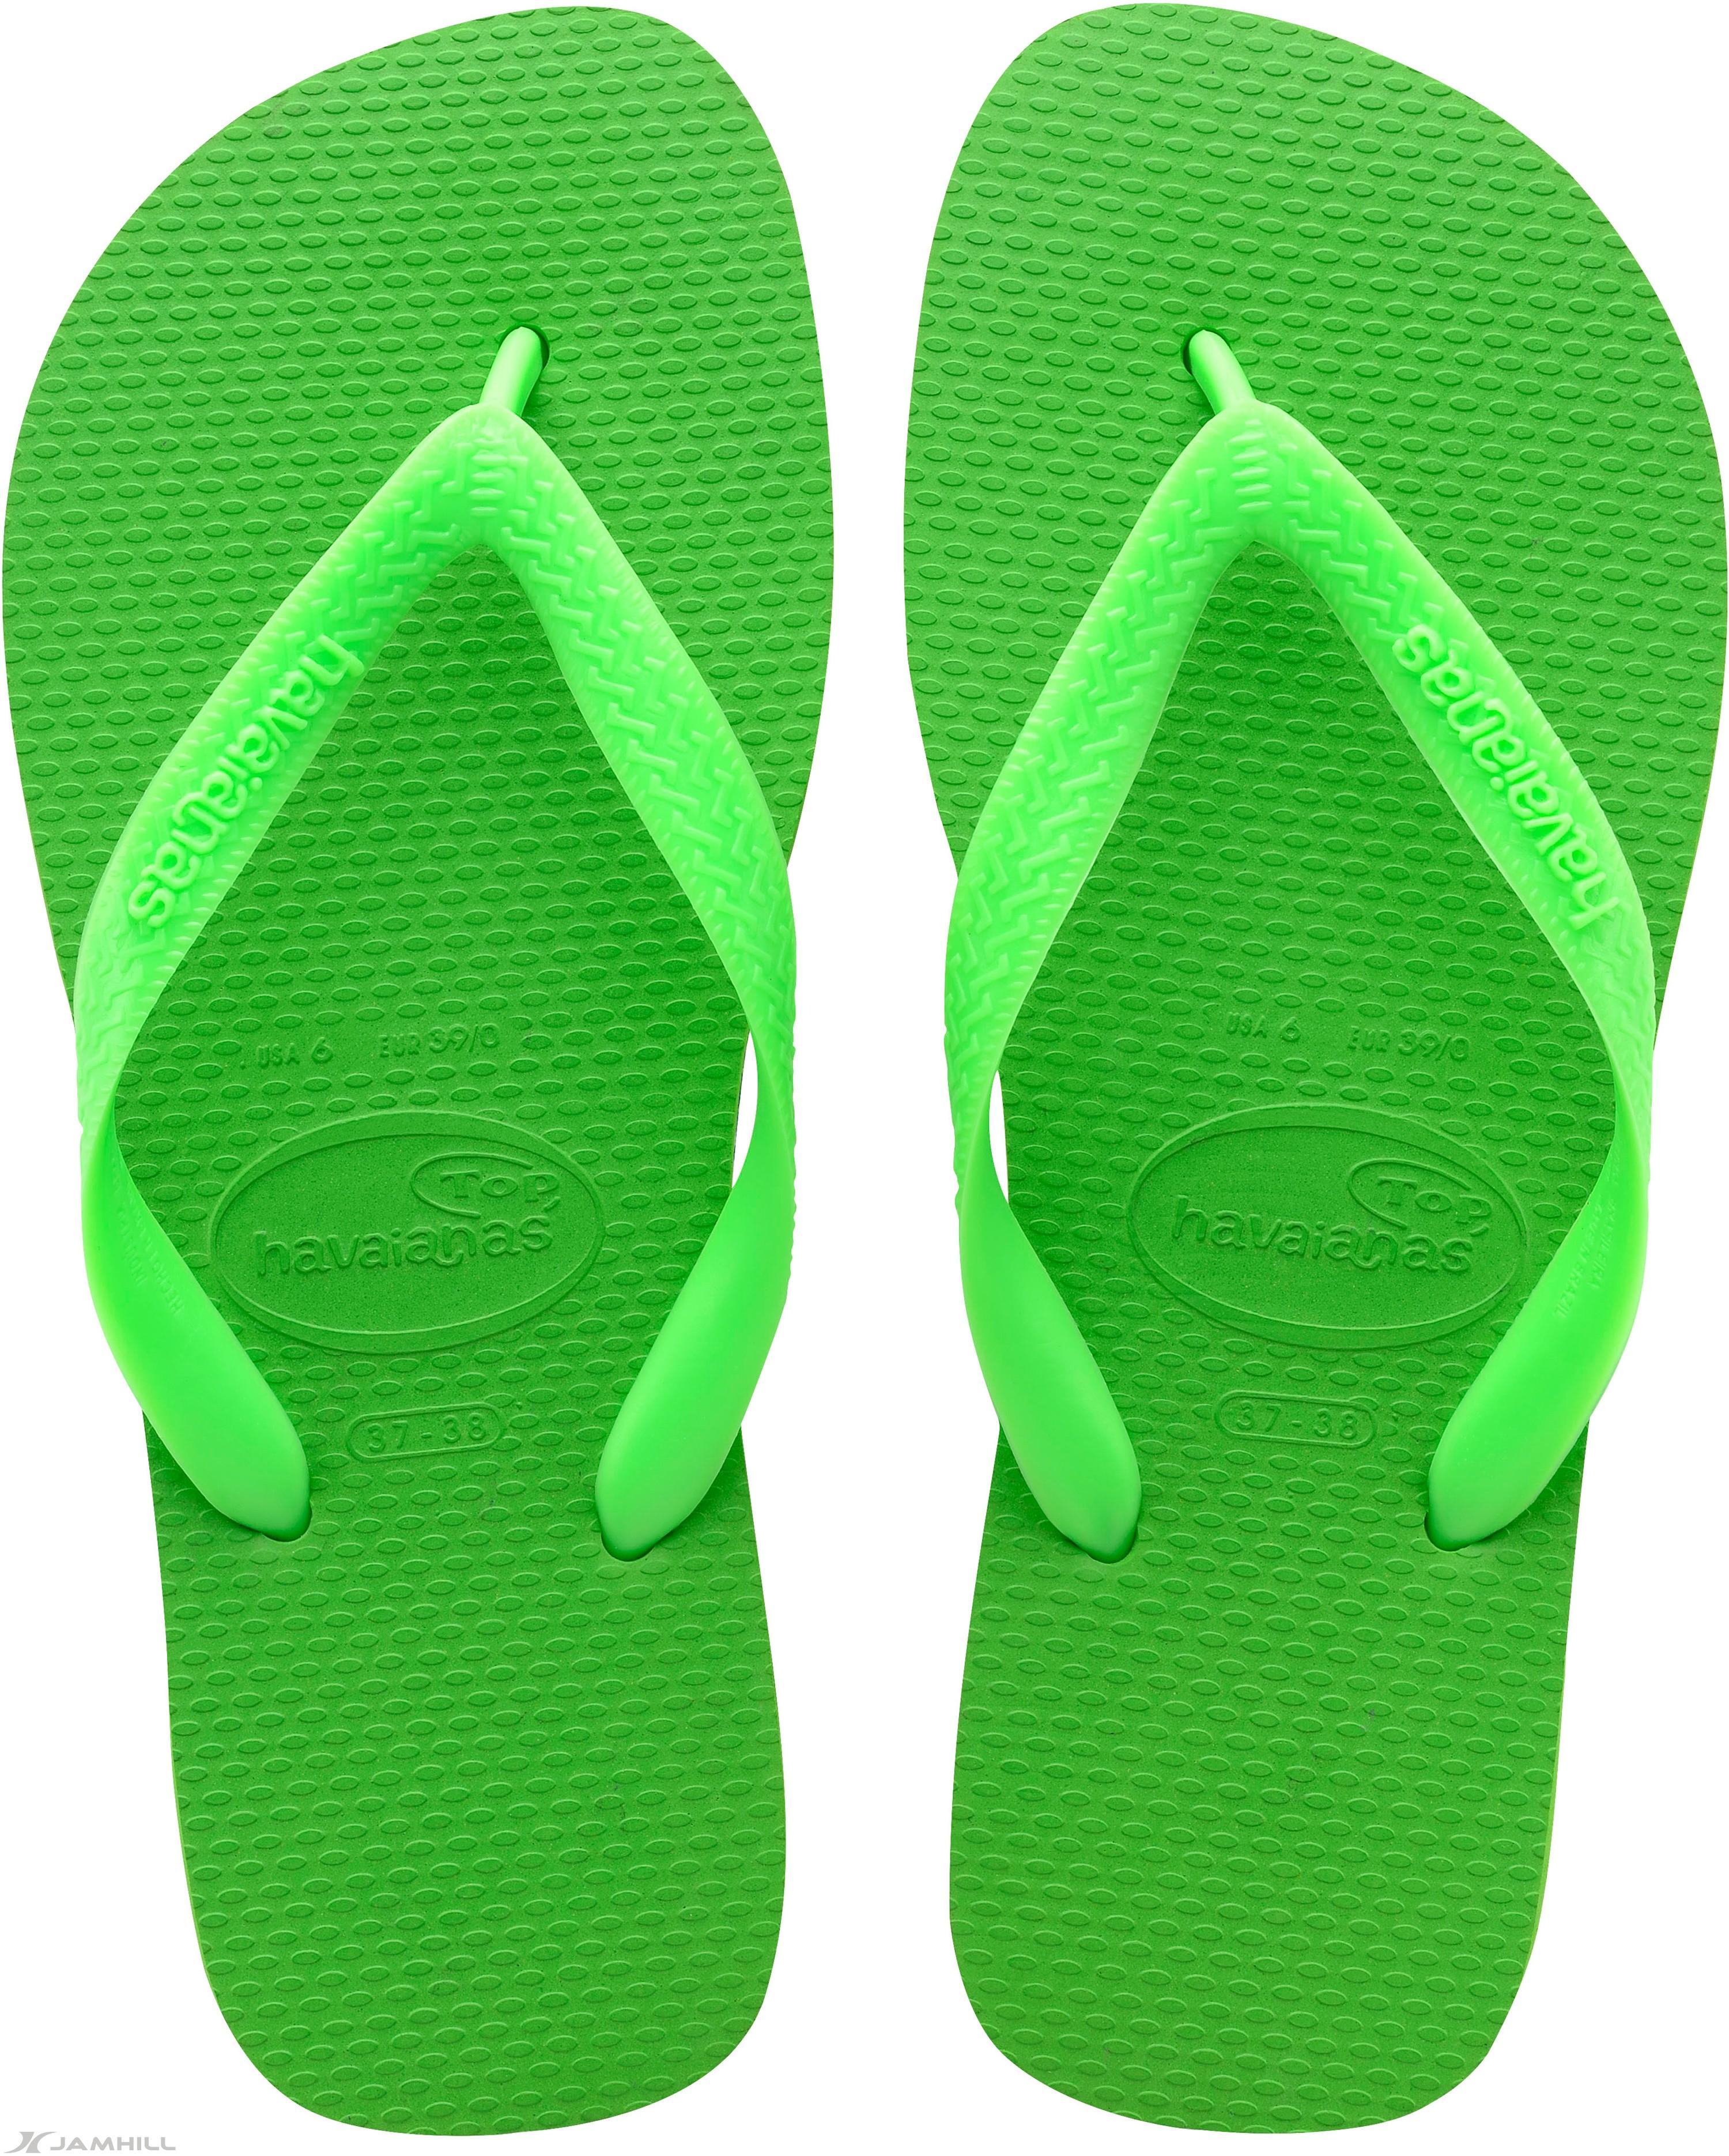 havaianas top flip flops the original unisex brazil sandals new ebay. Black Bedroom Furniture Sets. Home Design Ideas